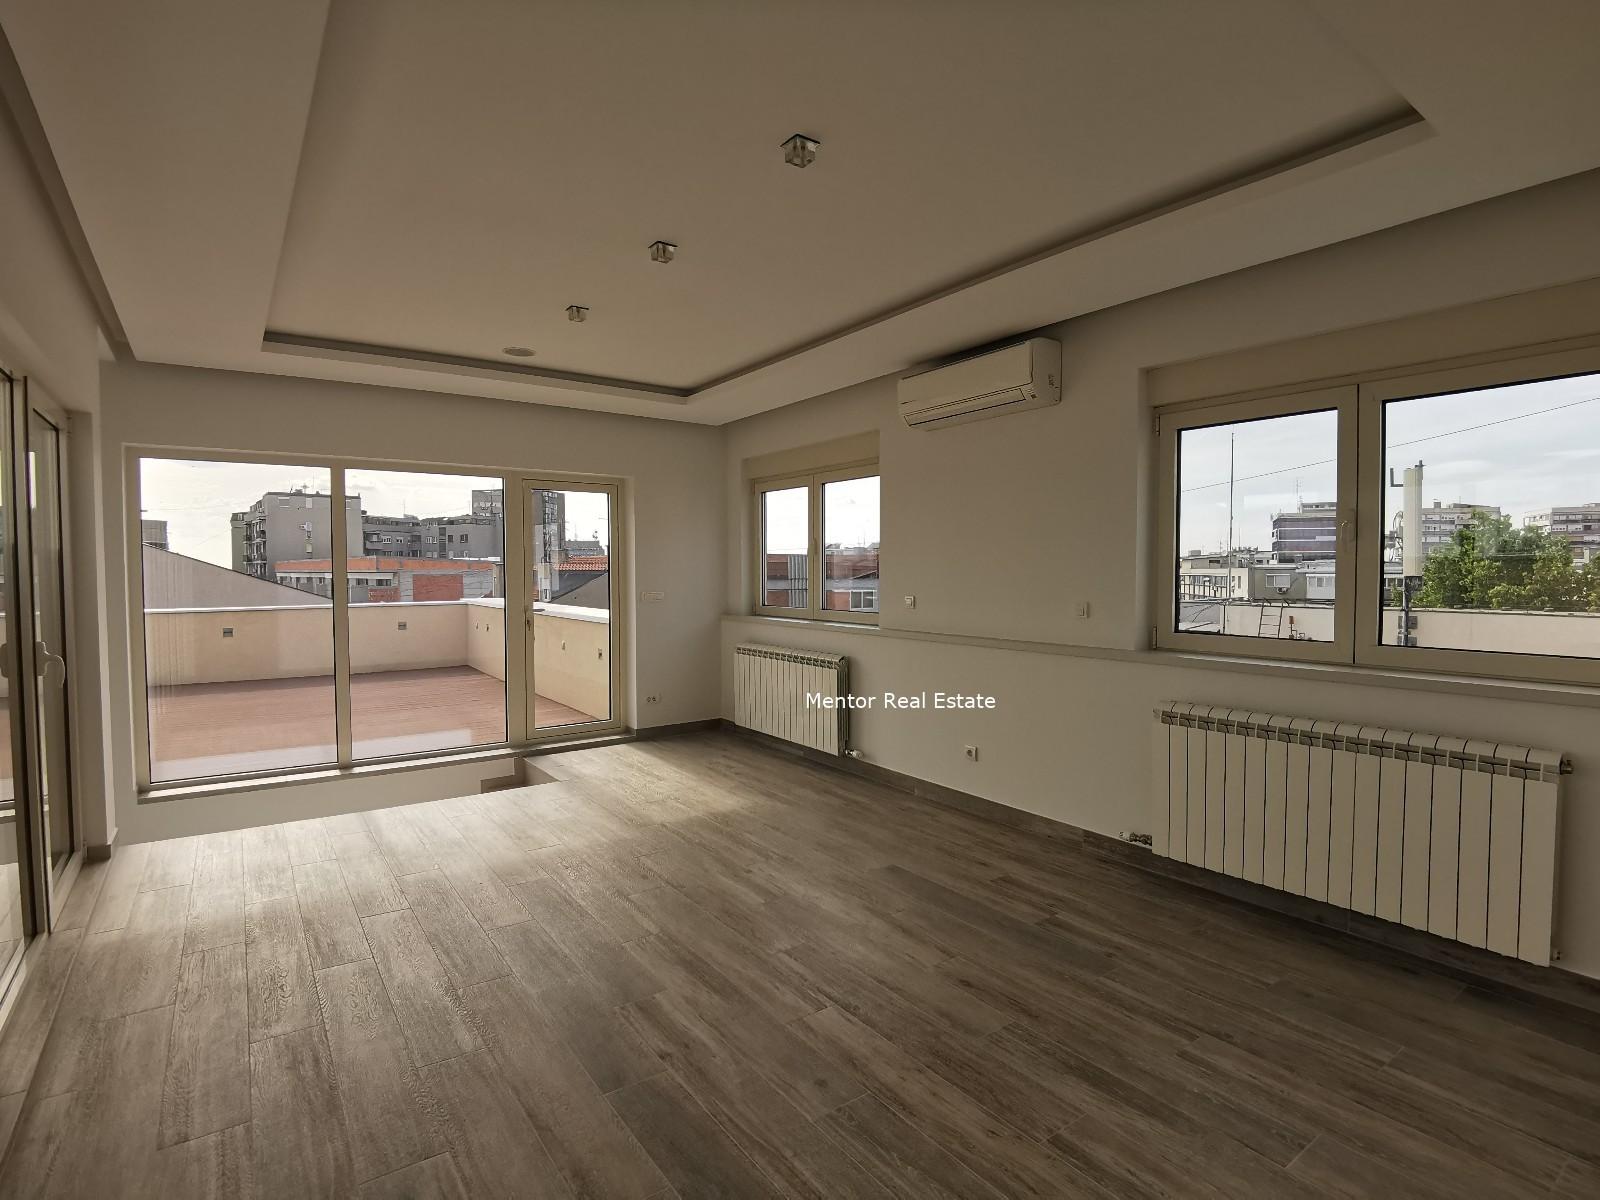 Vračar 380sqm penthouse for sale